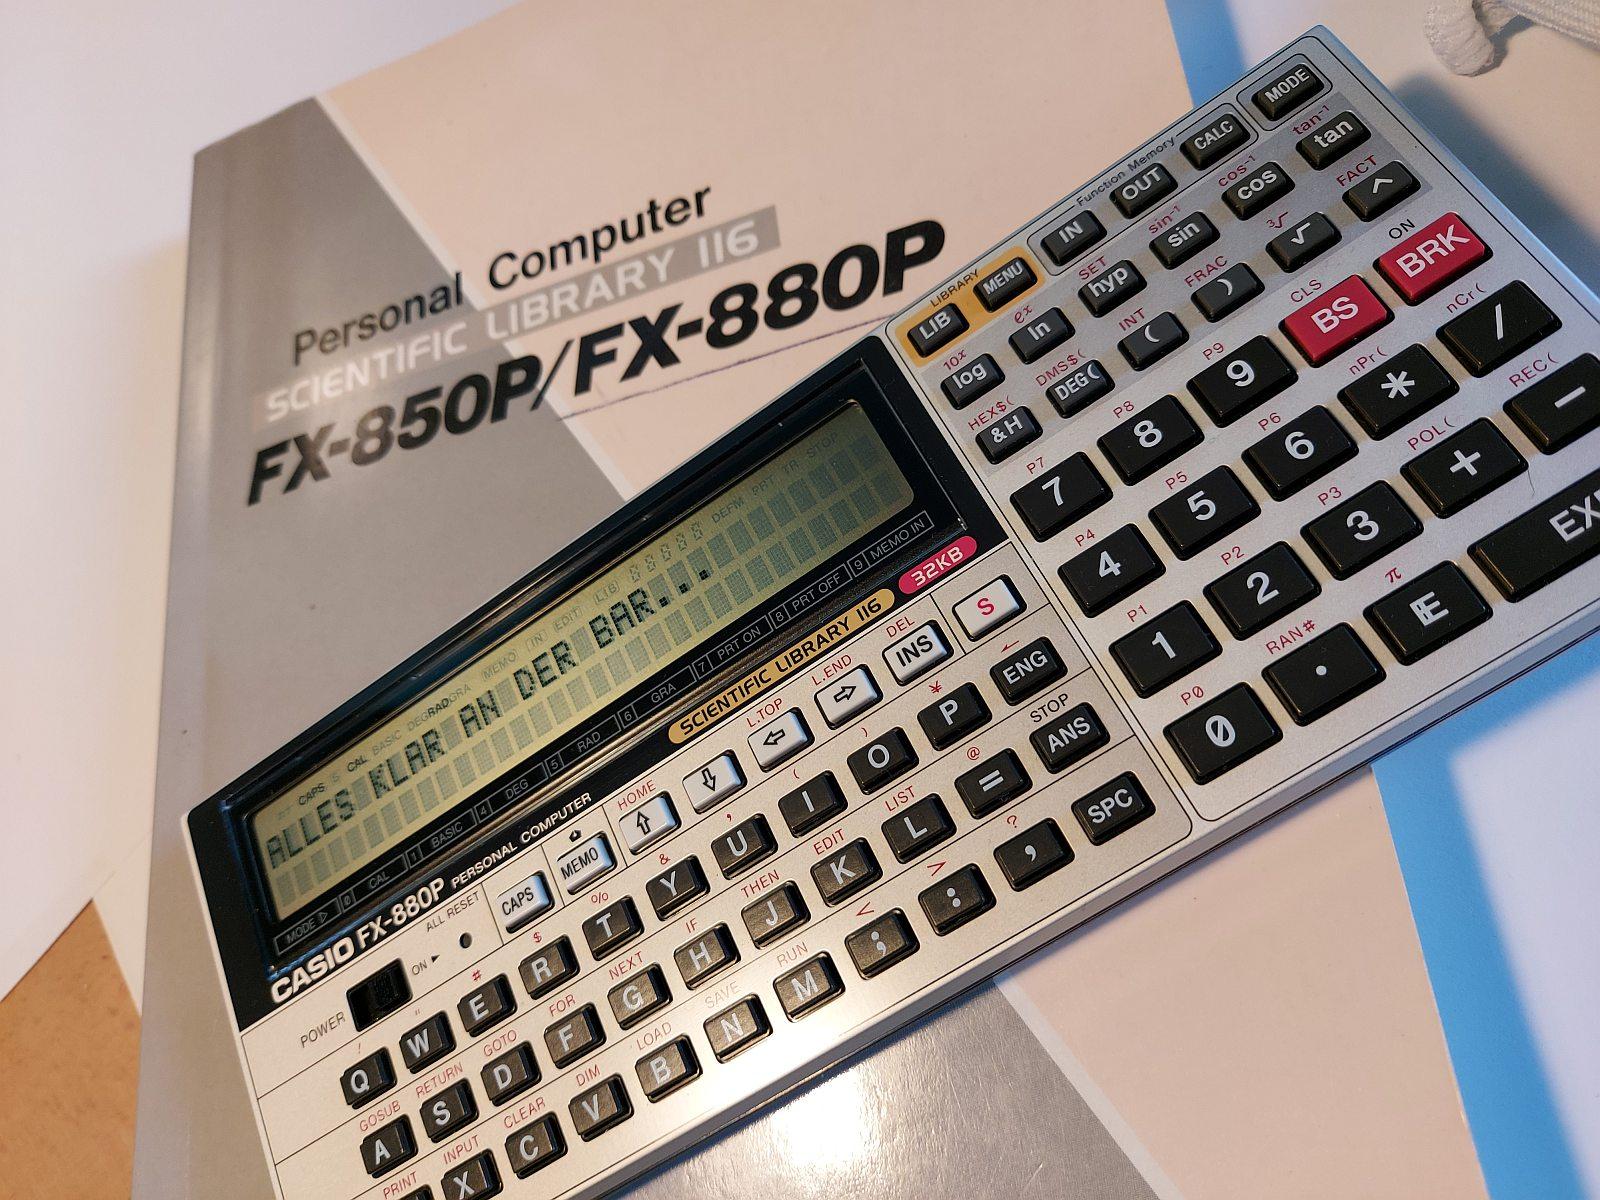 fx880p.jpg